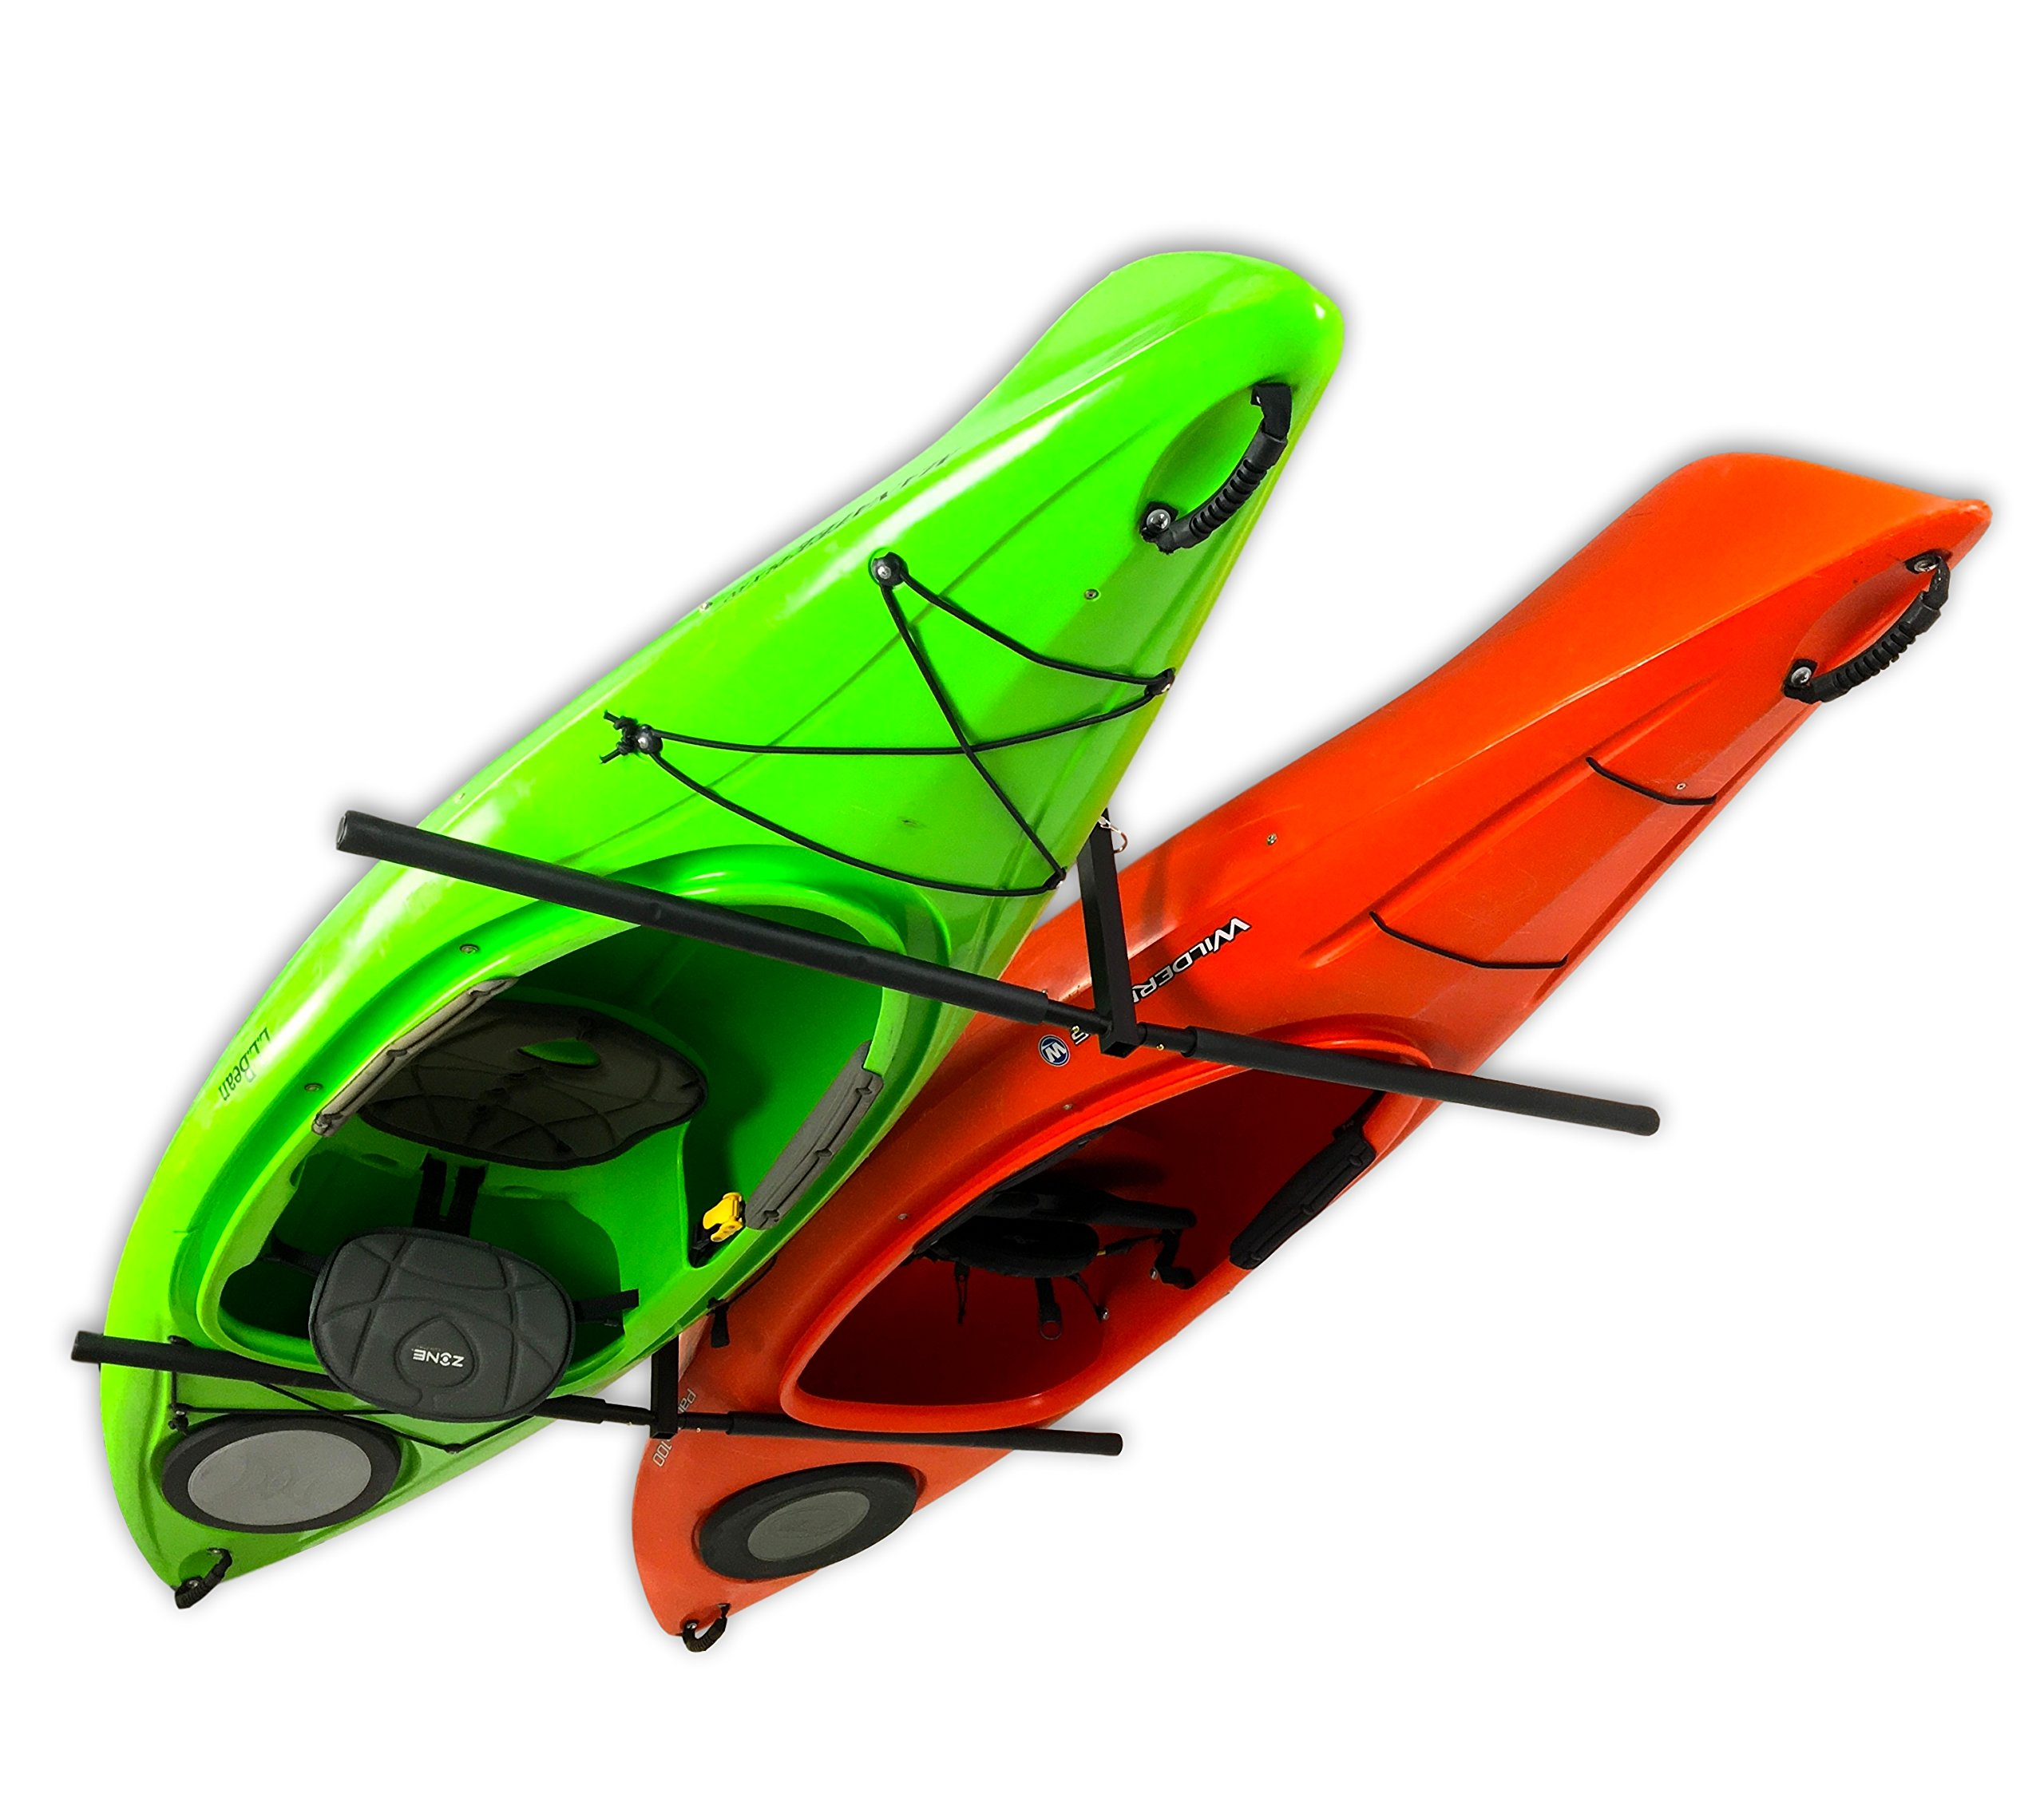 Amazon Com Storeyourboard 2 Kayak Ceiling Rack Hi Port 2 Storage Hanger Overhead Mount Adjustable Extra Large 30 Arms Sports Outdoors